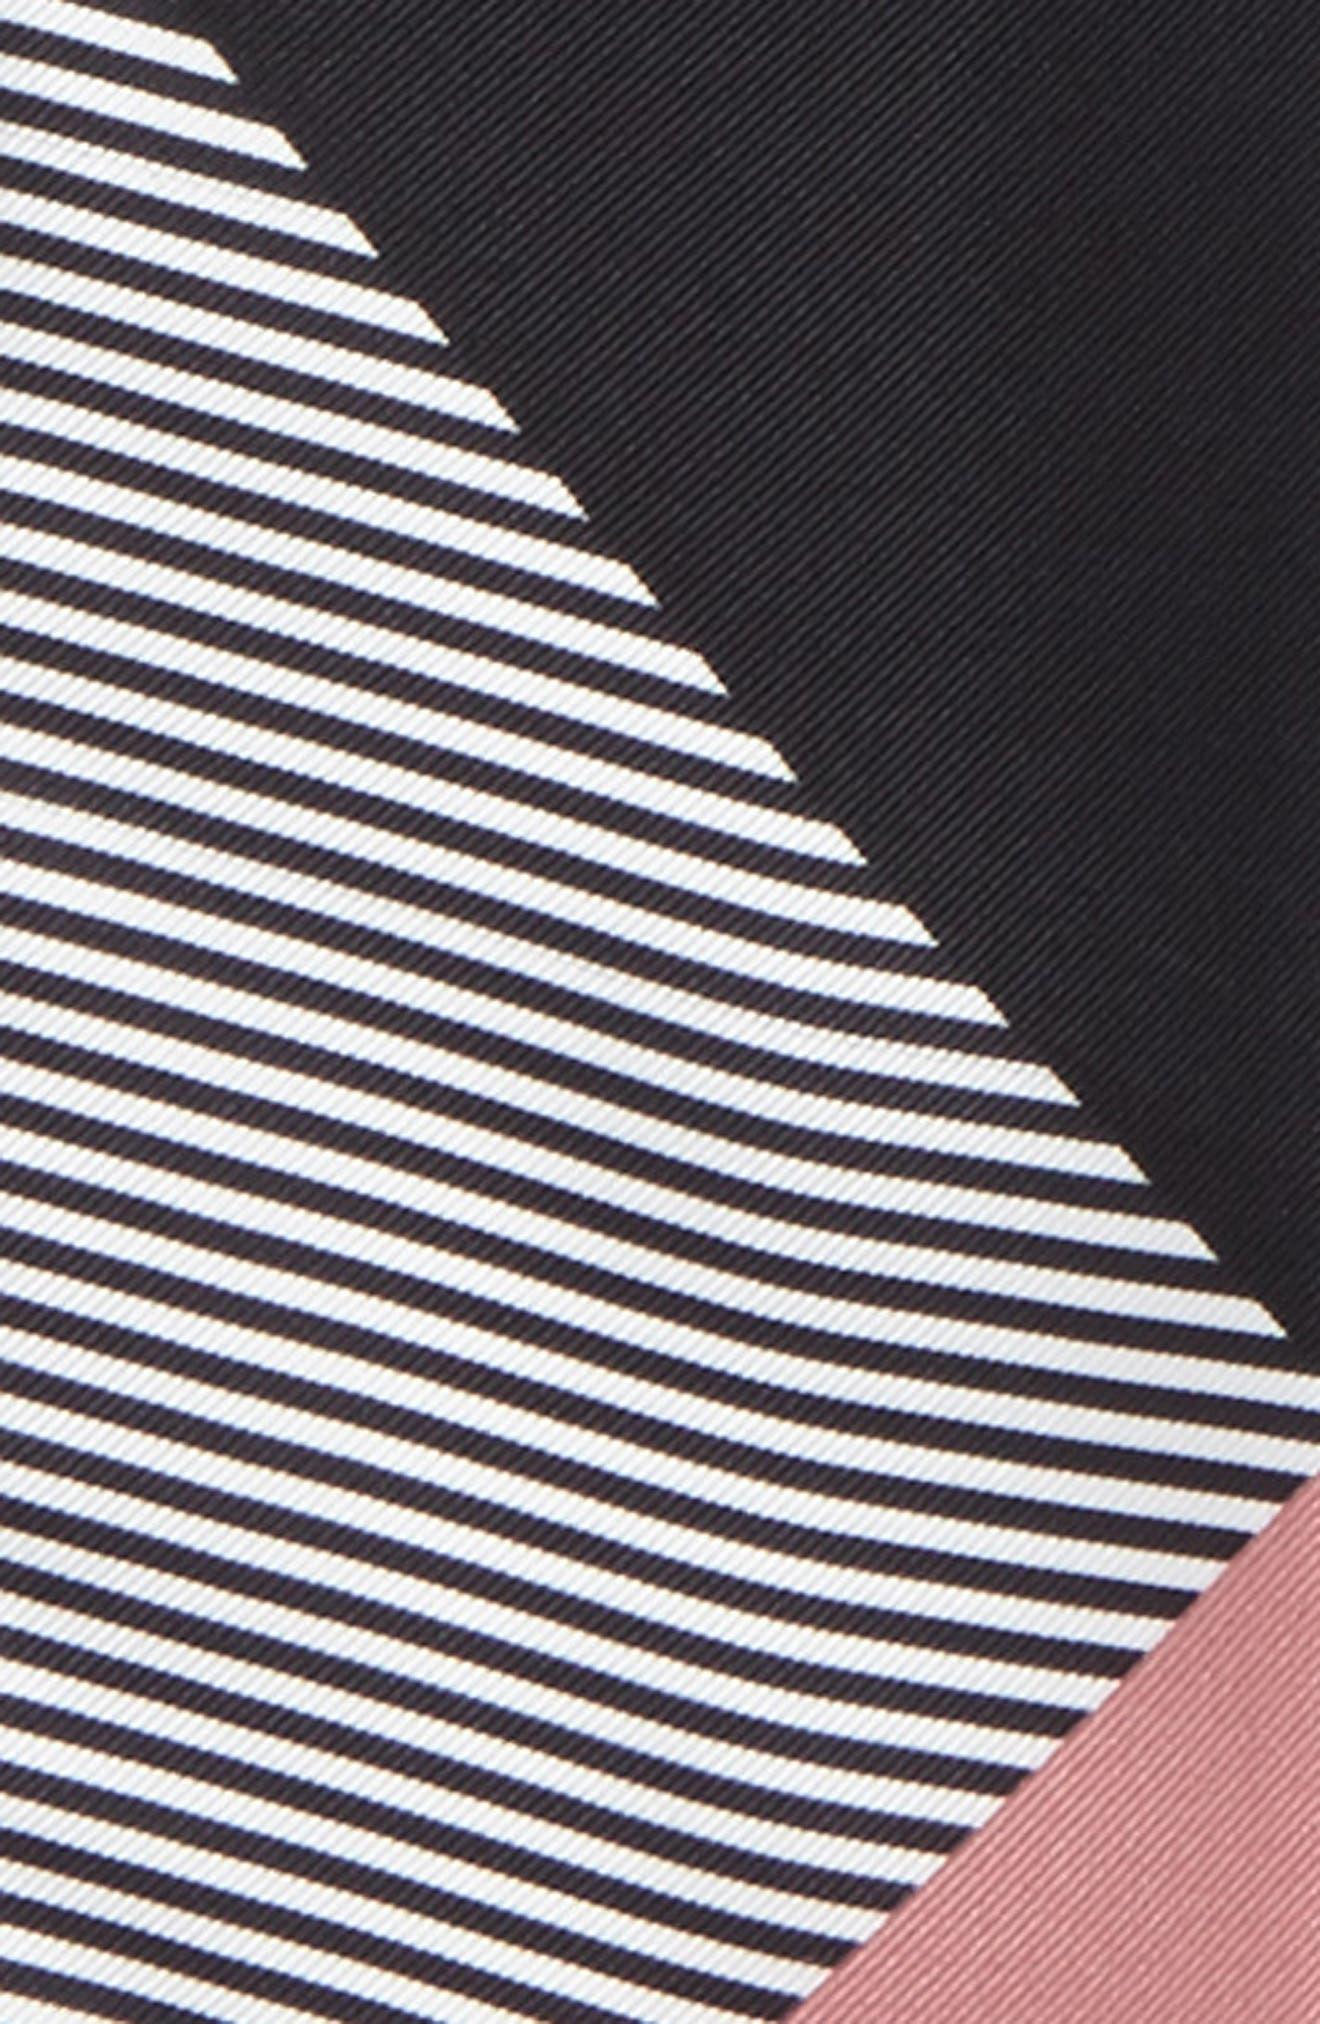 Mega Check Silk Skinny Scarf,                             Alternate thumbnail 3, color,                             Pale Bluebell